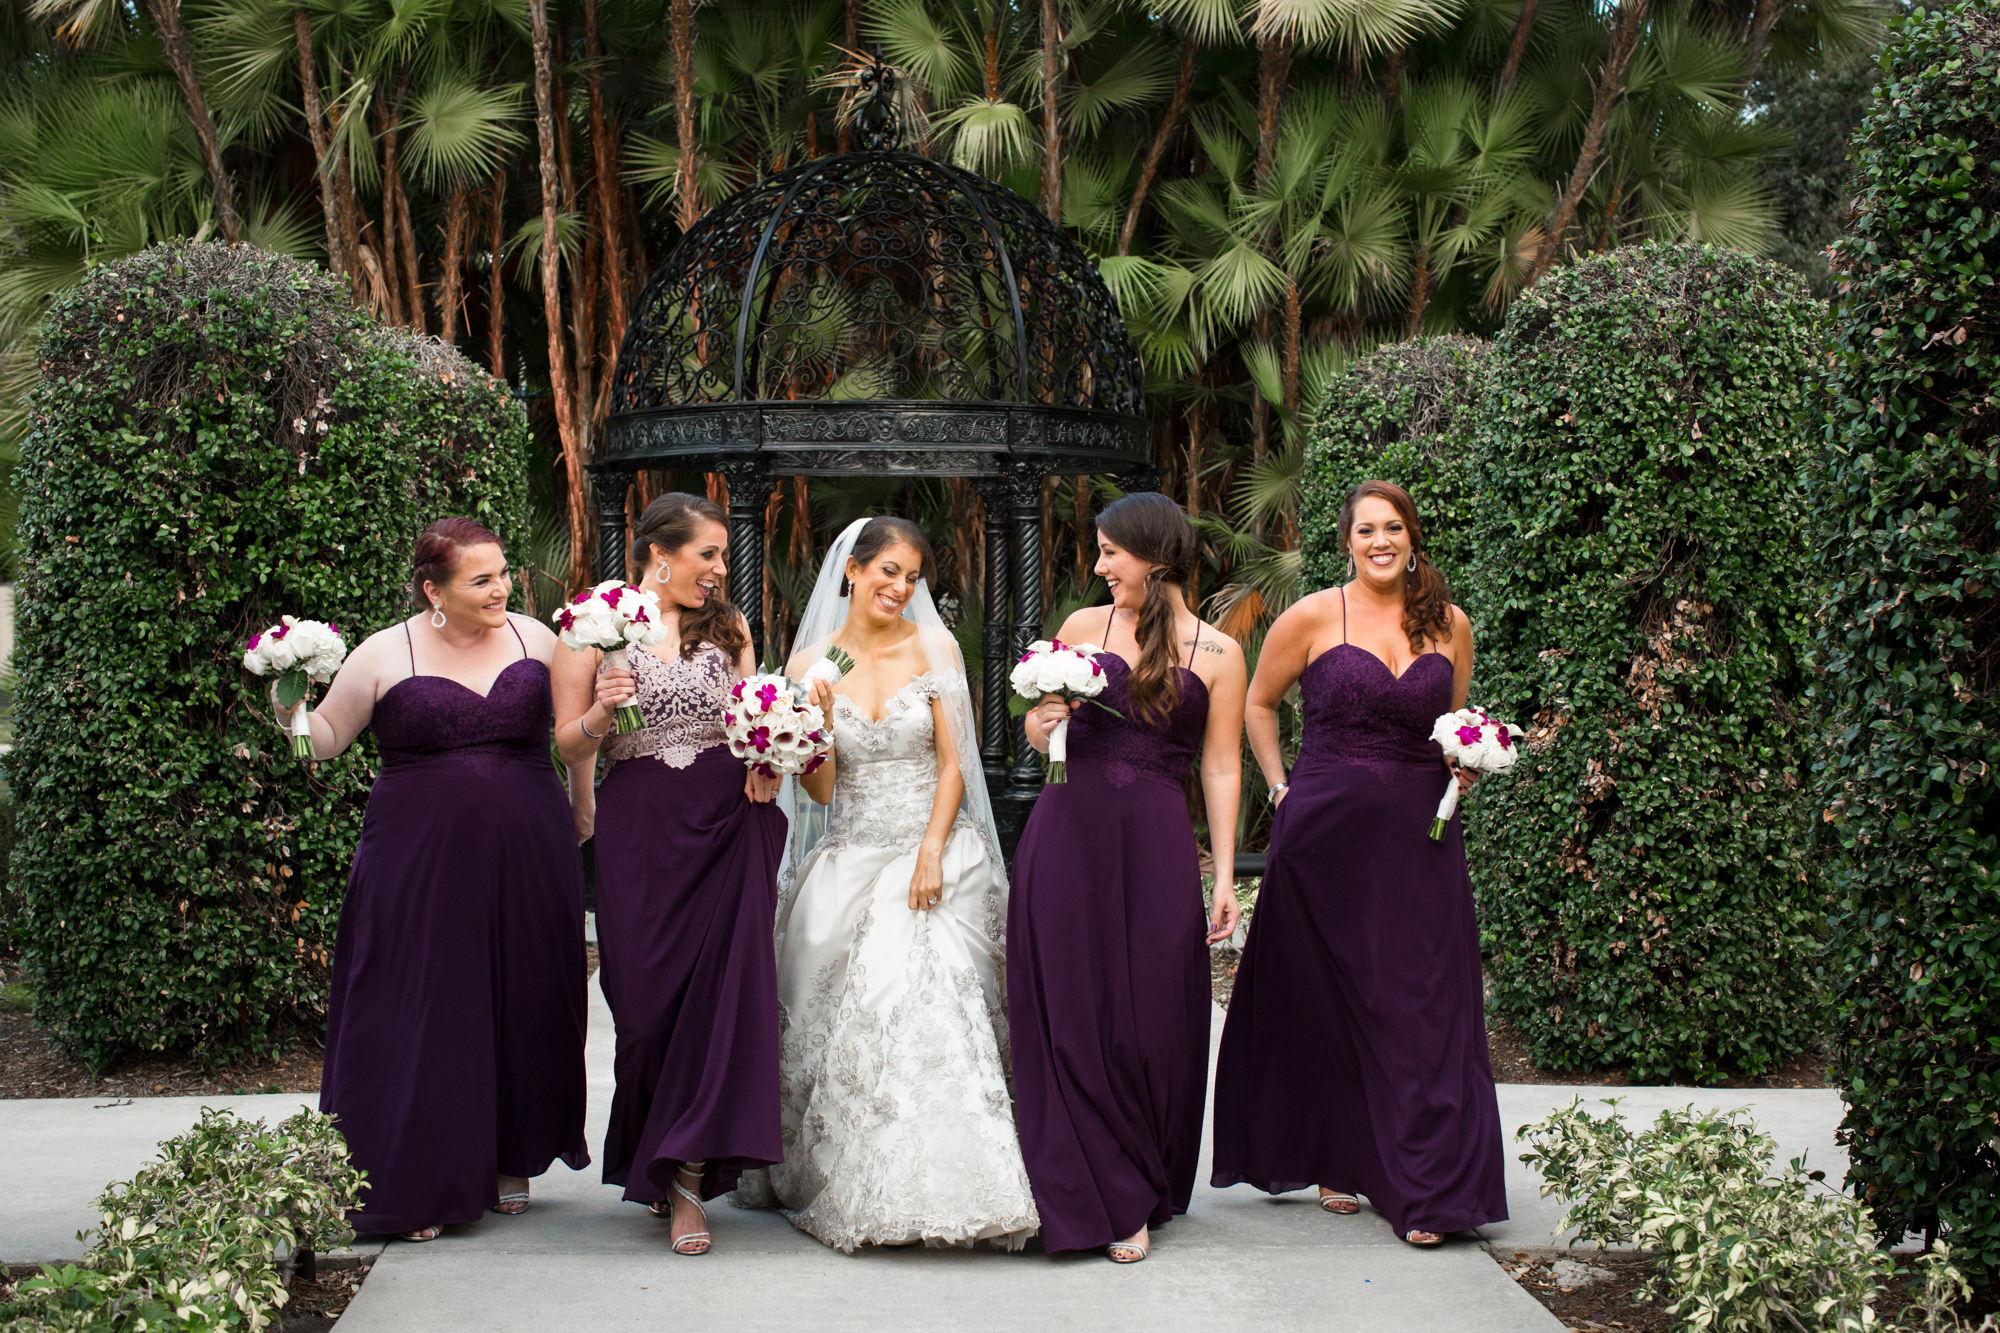 Benvenuto_Wedding_catholic_Florida_Bride-Groom-67.jpg